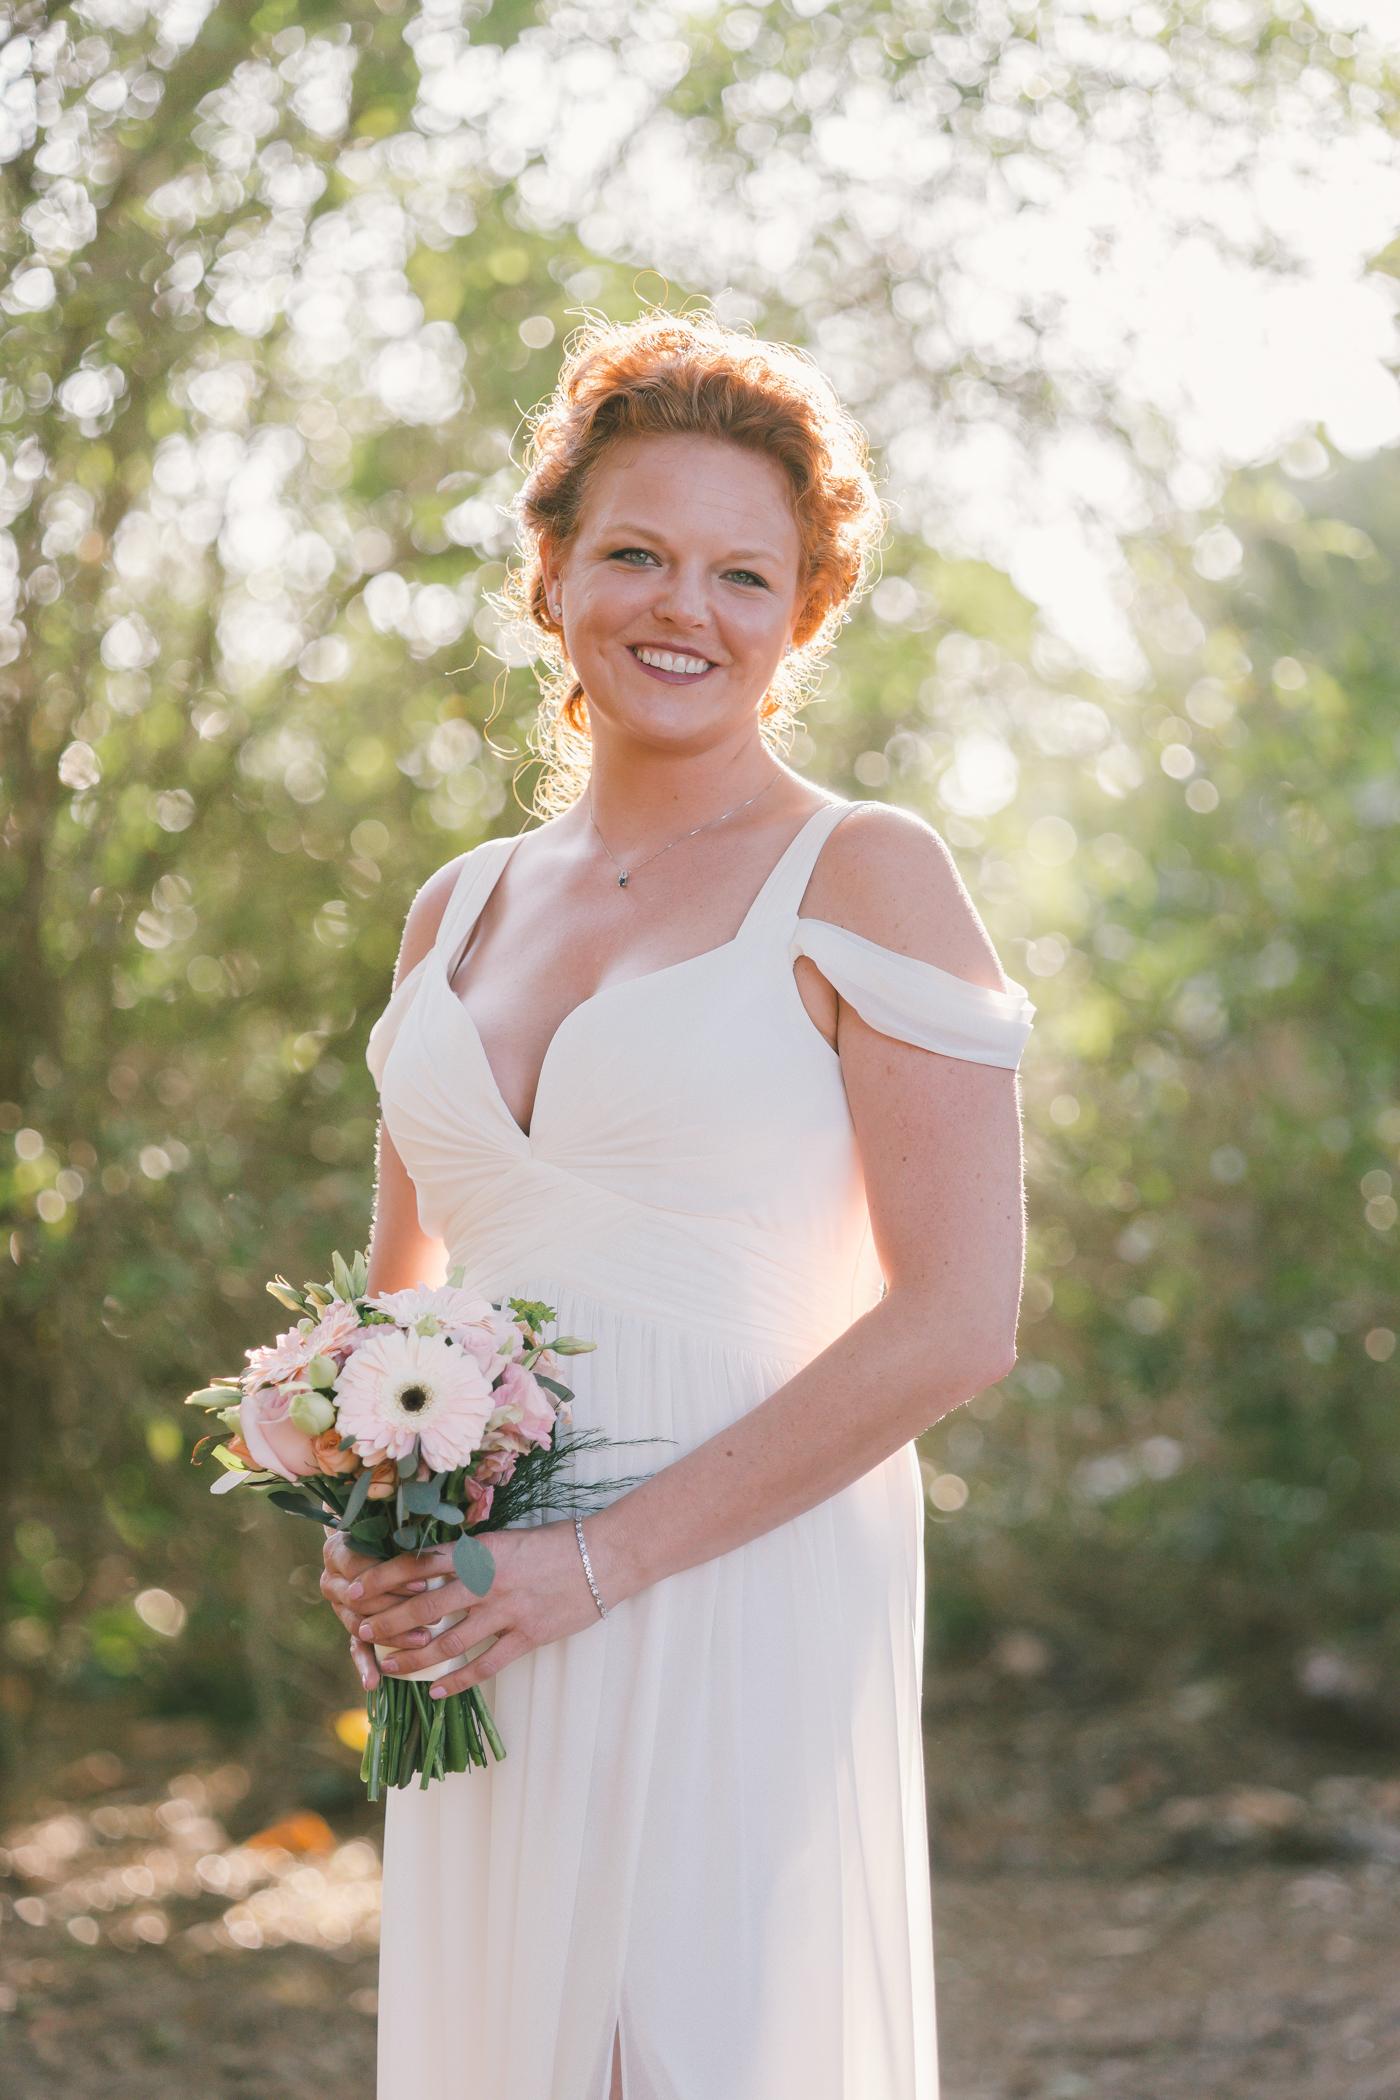 bride-beach-wedding-photo, tide-the-knot-beach-weddings